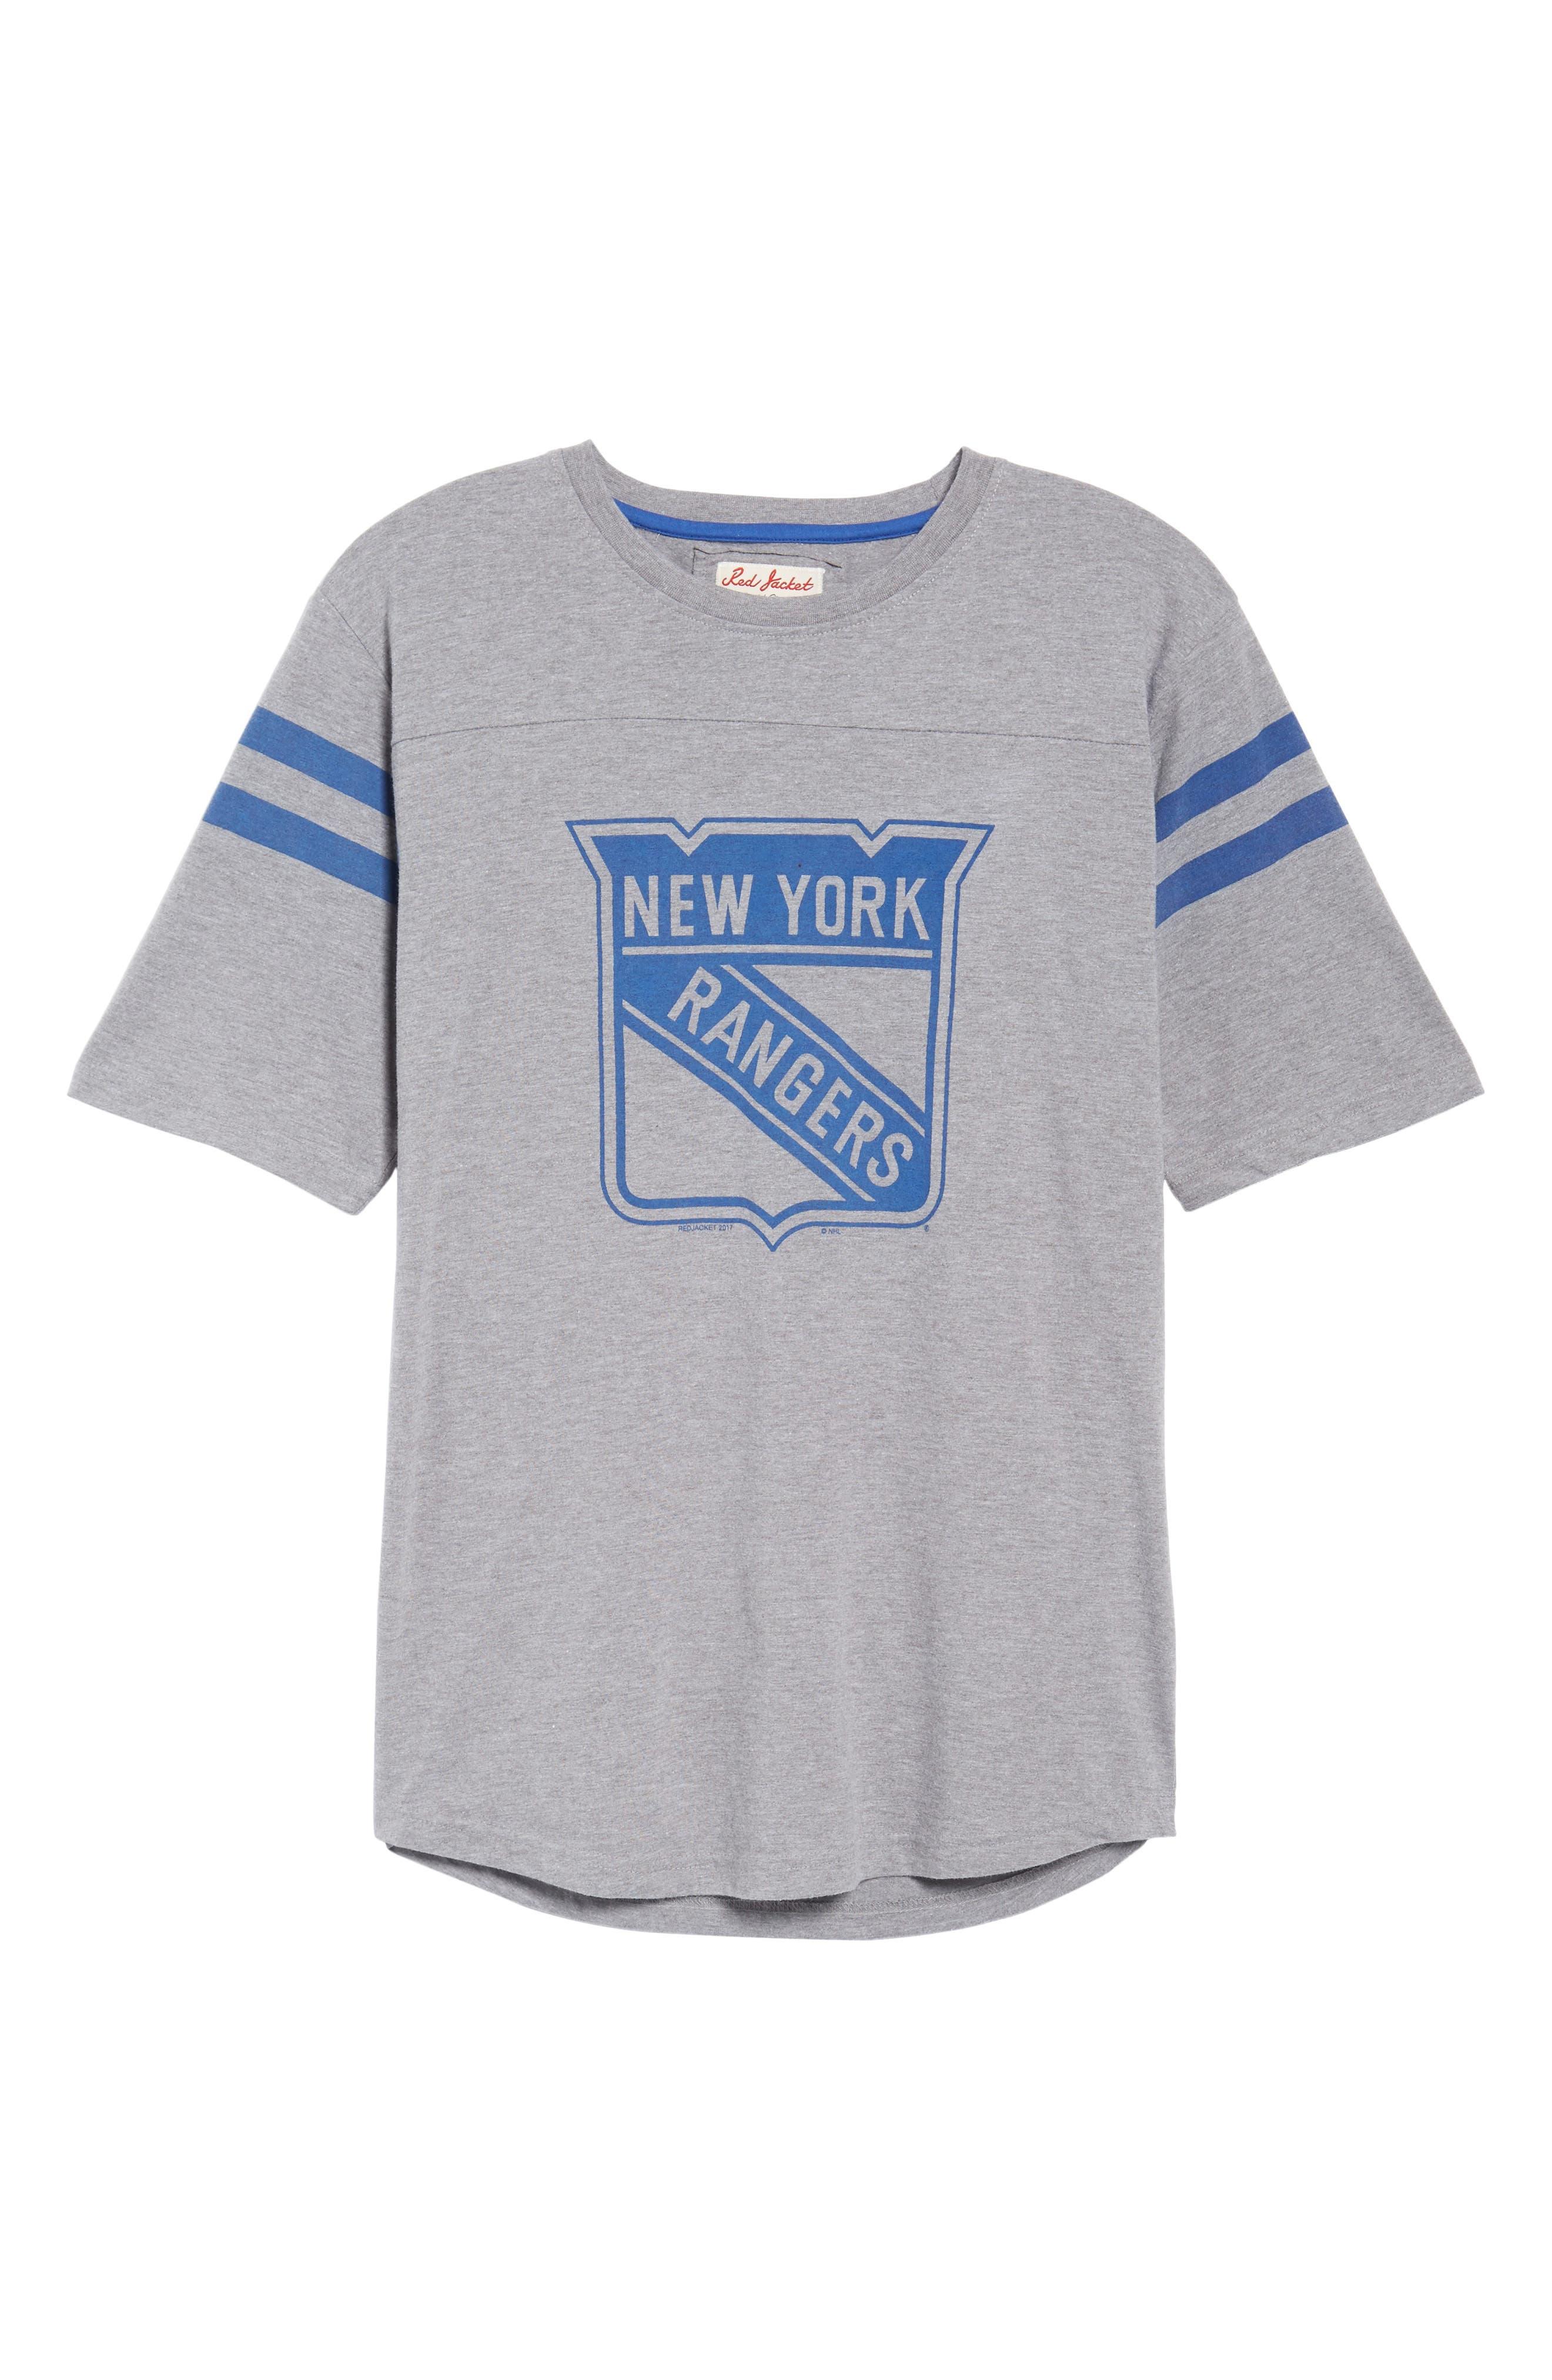 Crosby New York Rangers T-Shirt,                             Alternate thumbnail 6, color,                             073